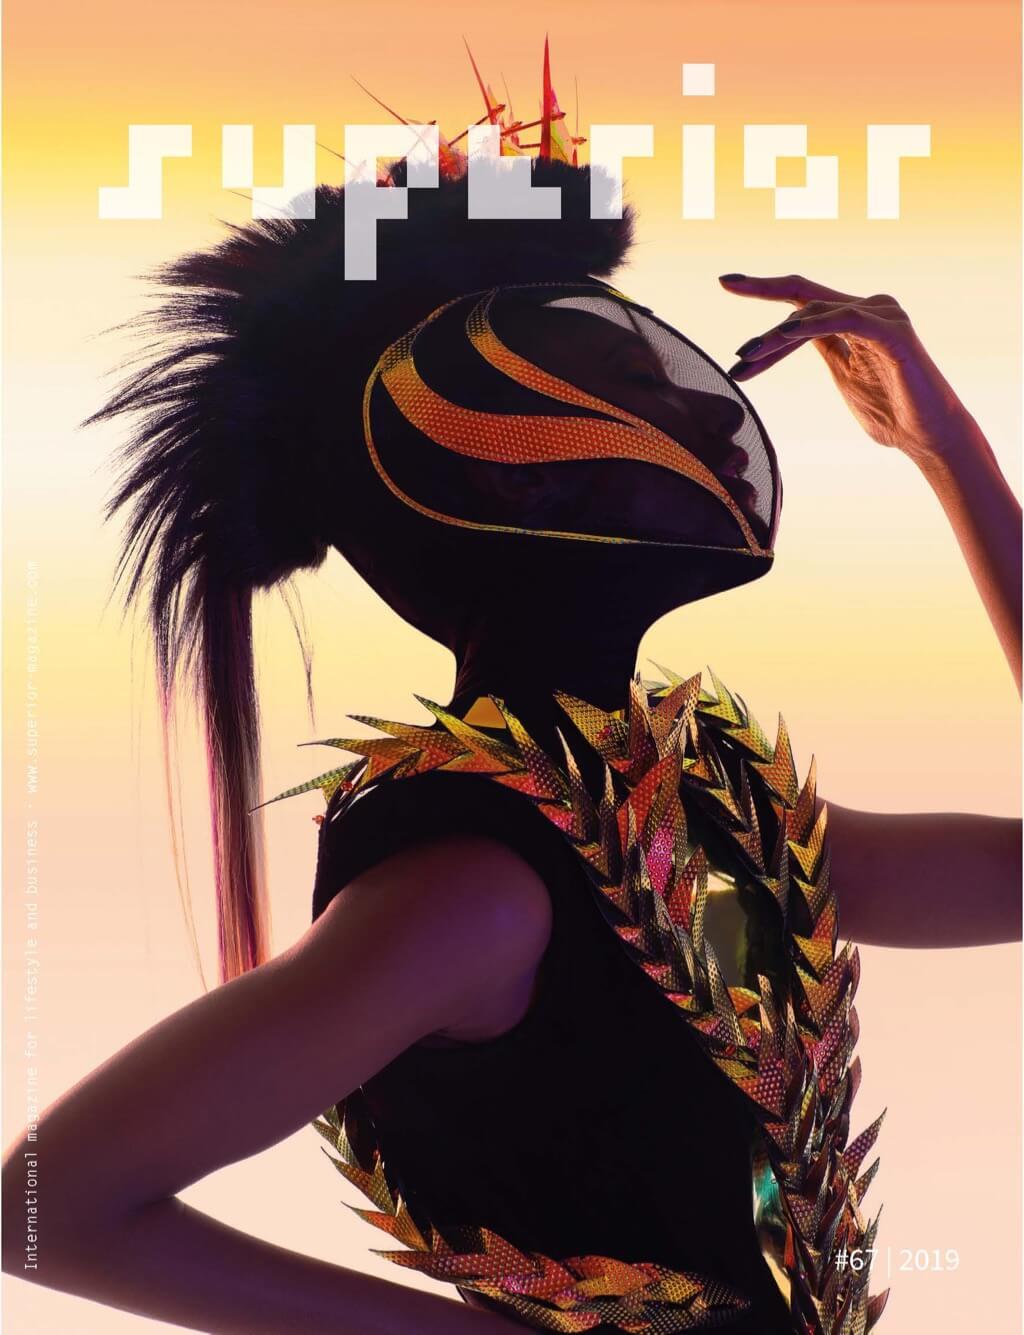 Superior Magazine # 67 - Cover by Jose Espaillat